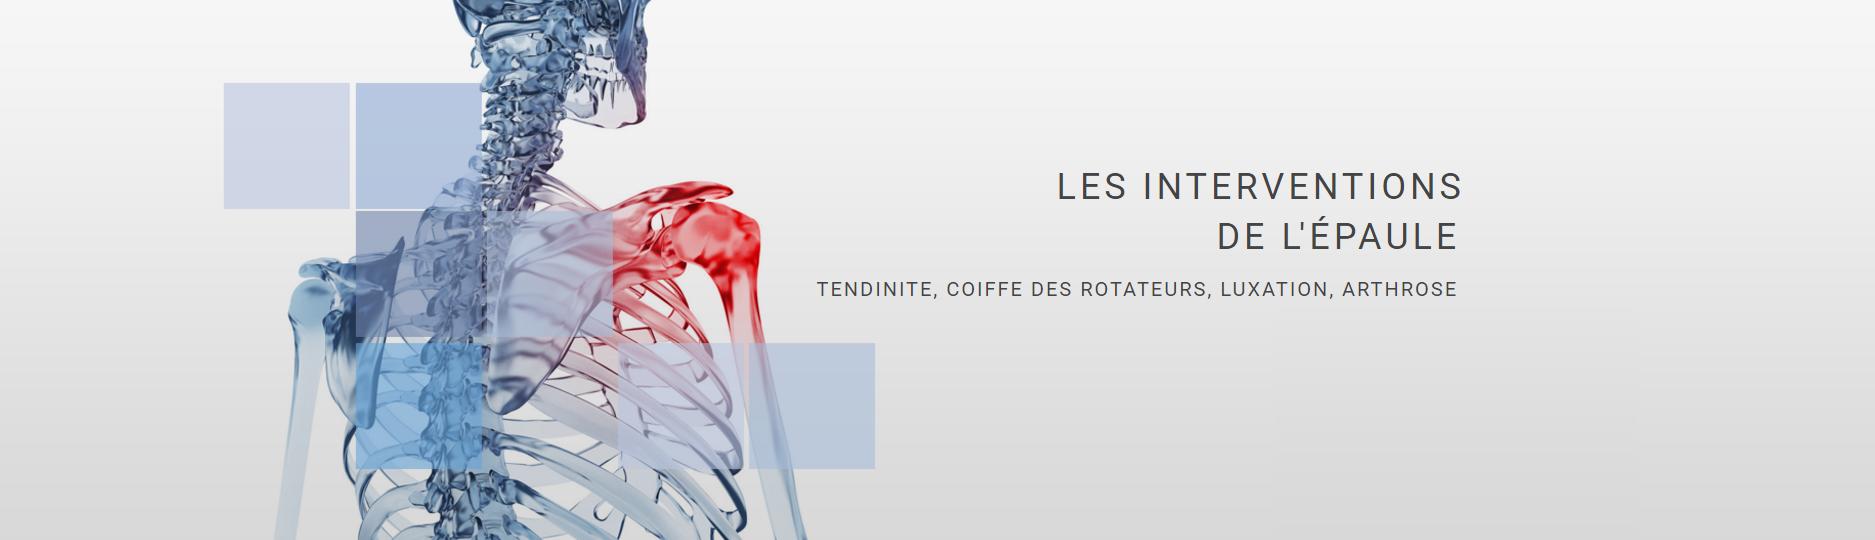 intervention-epaule-chirurgie-orthopedique-traumatologie-nice-docteur-gael-poiree-slide-1